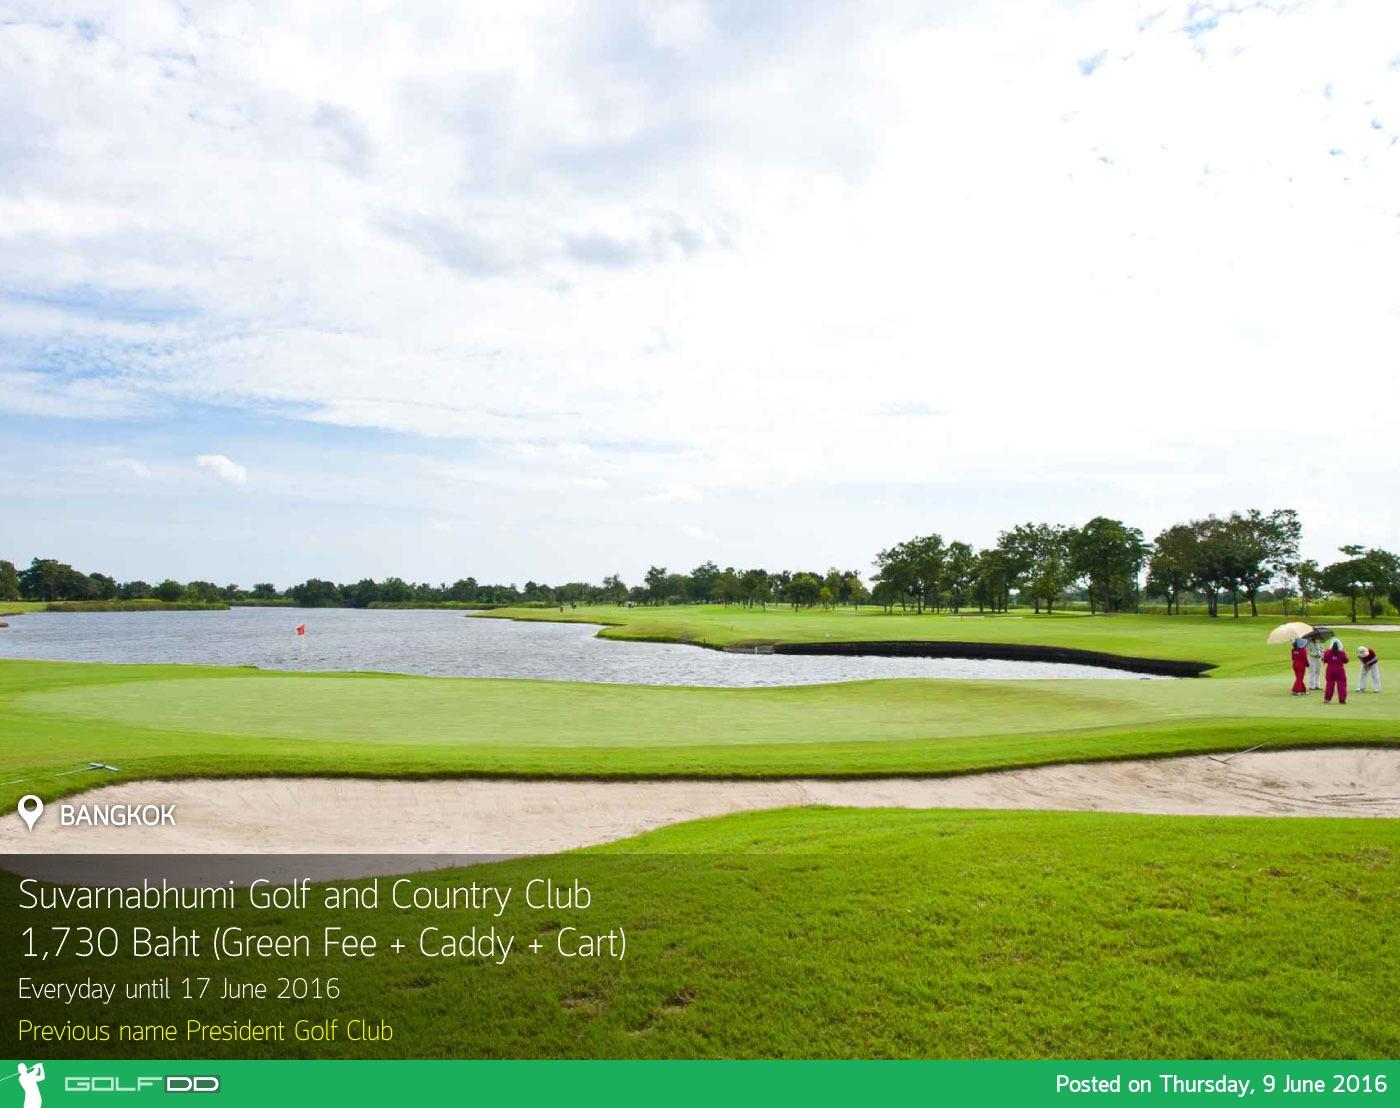 Suvarnabhumi Golf and Country Club News สนามกอล์ฟ สุวรรณภูมิ กอล์ฟ แอนด์ คันทรี คลับ